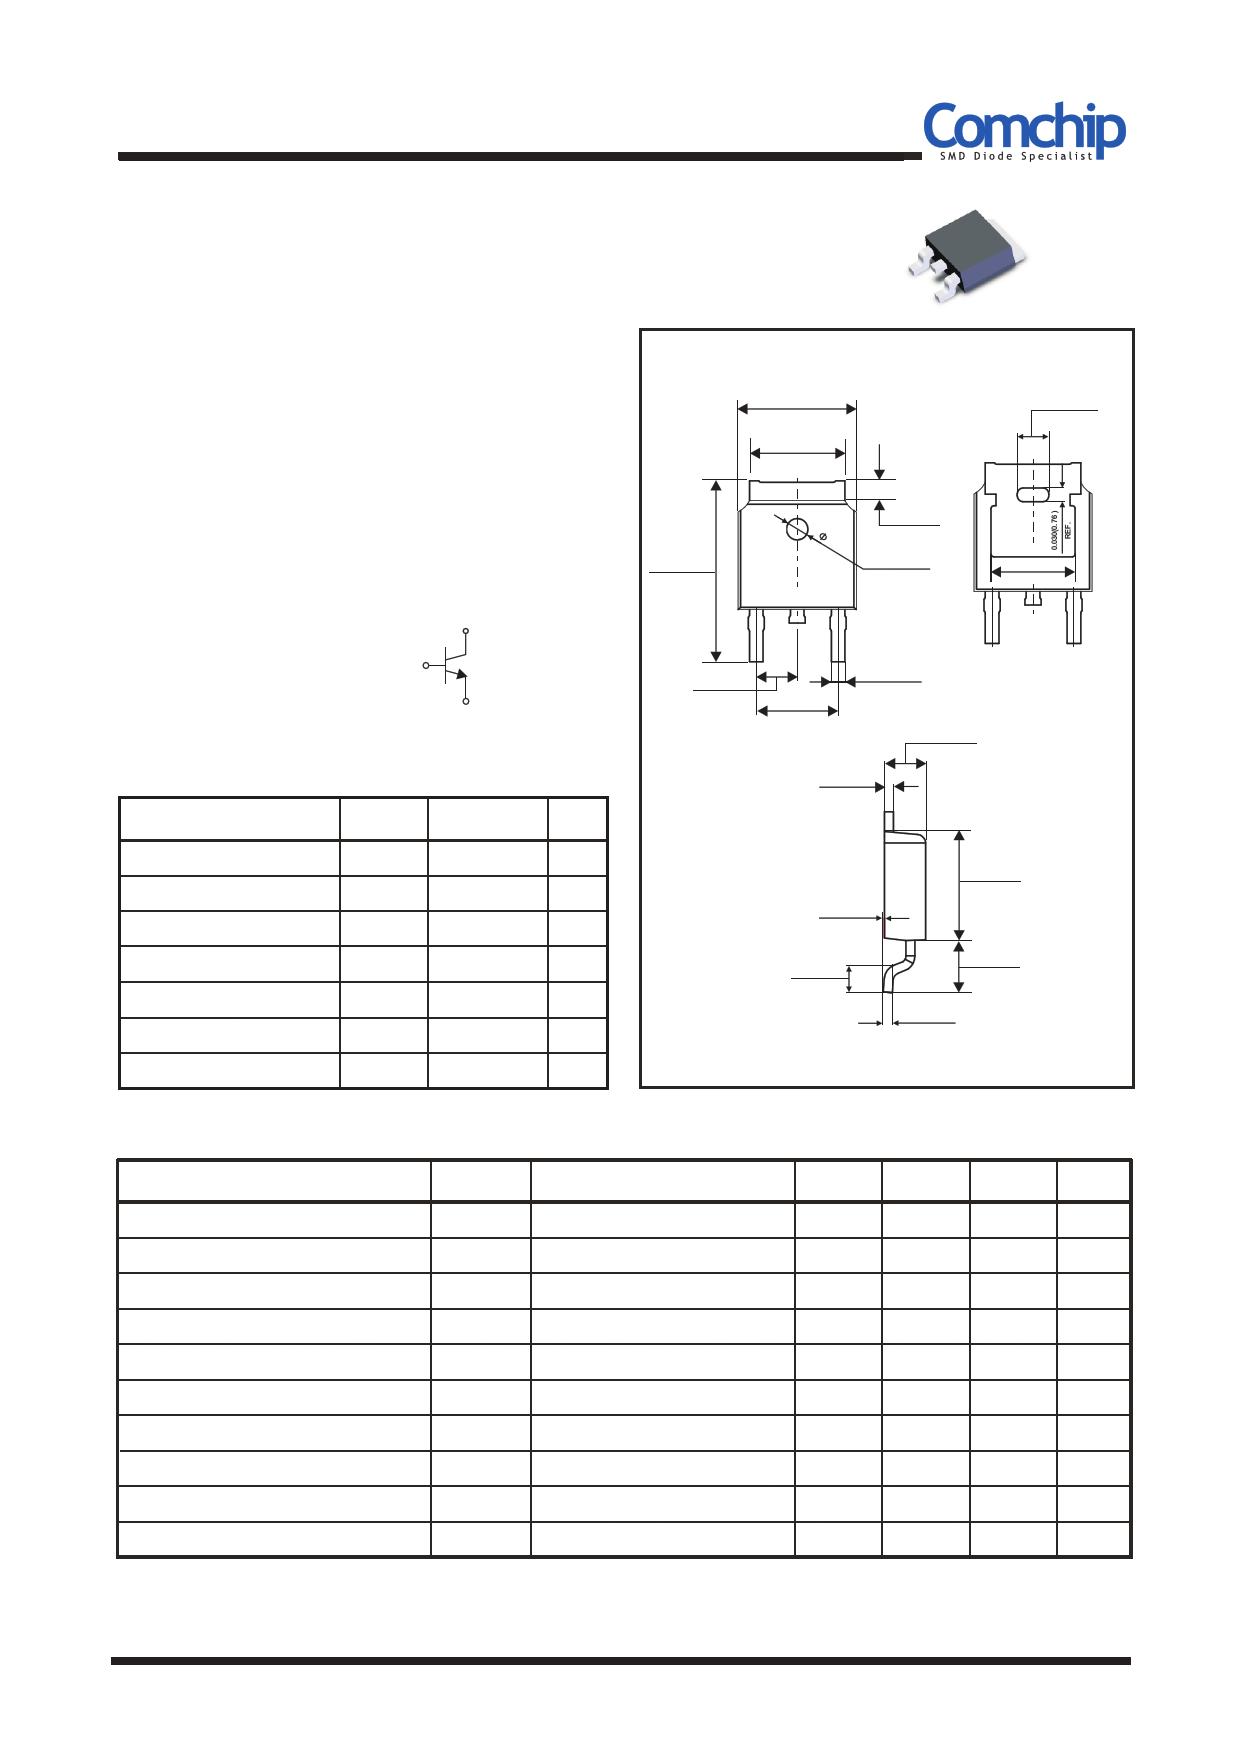 d882m-g 数据手册, 描述, 功能